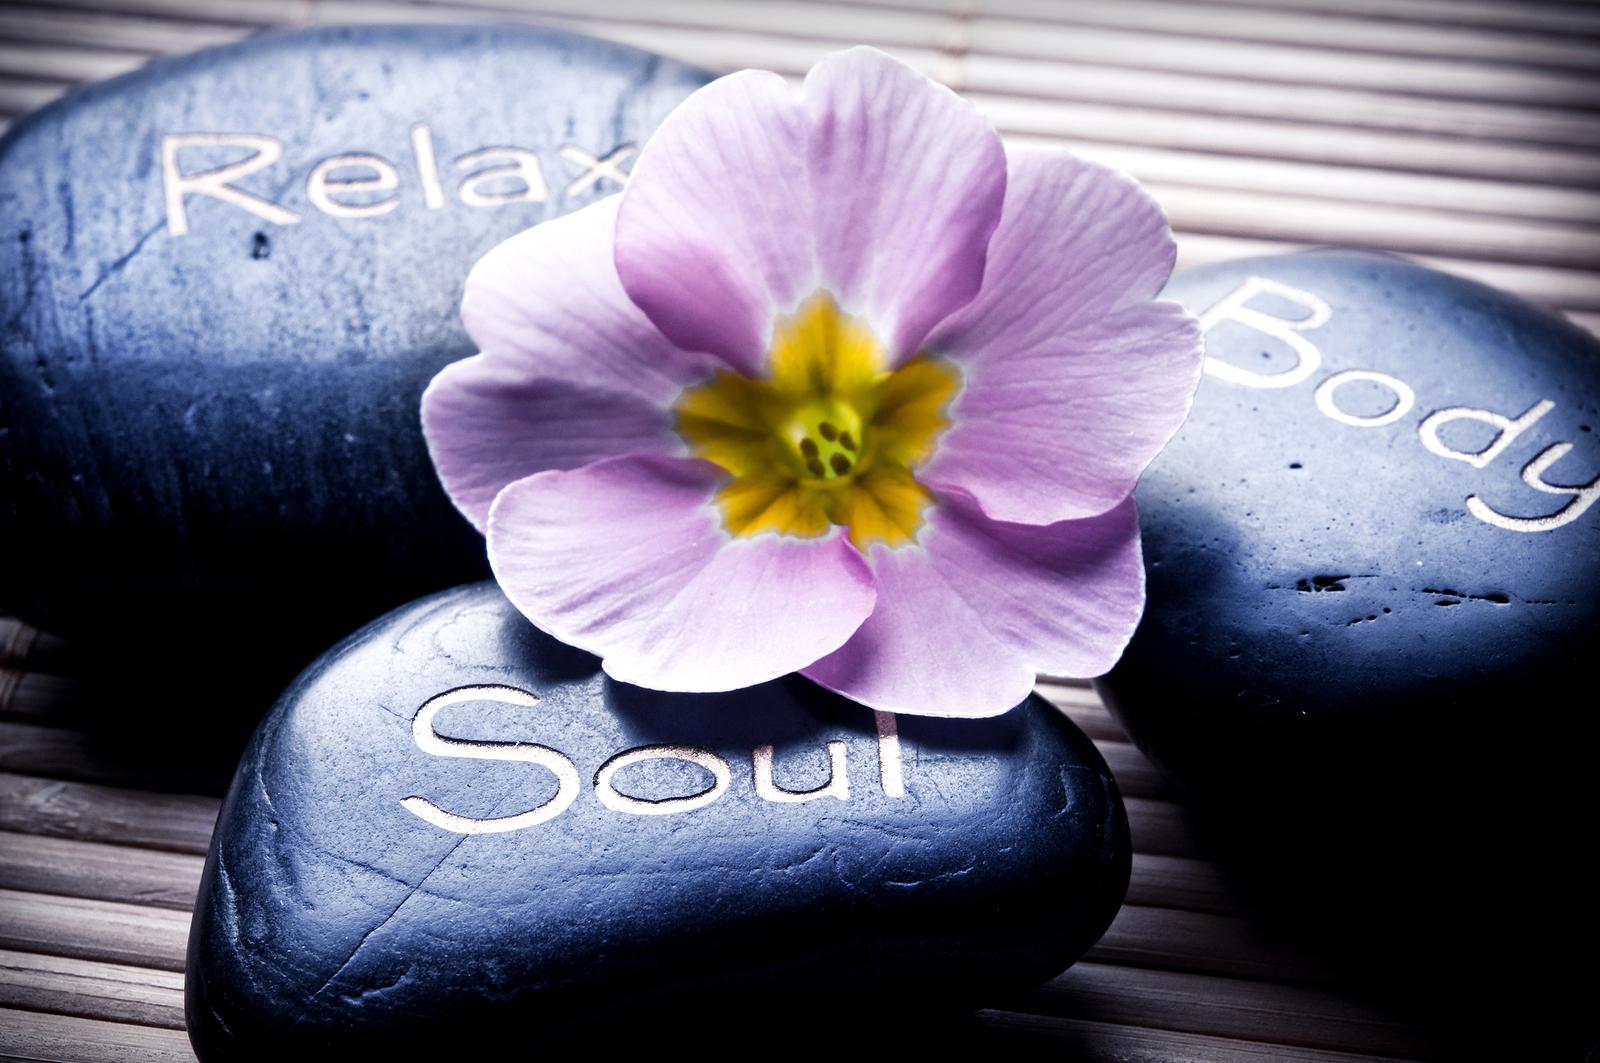 bigstock-three-massage-stones--relax--16383113.jpg